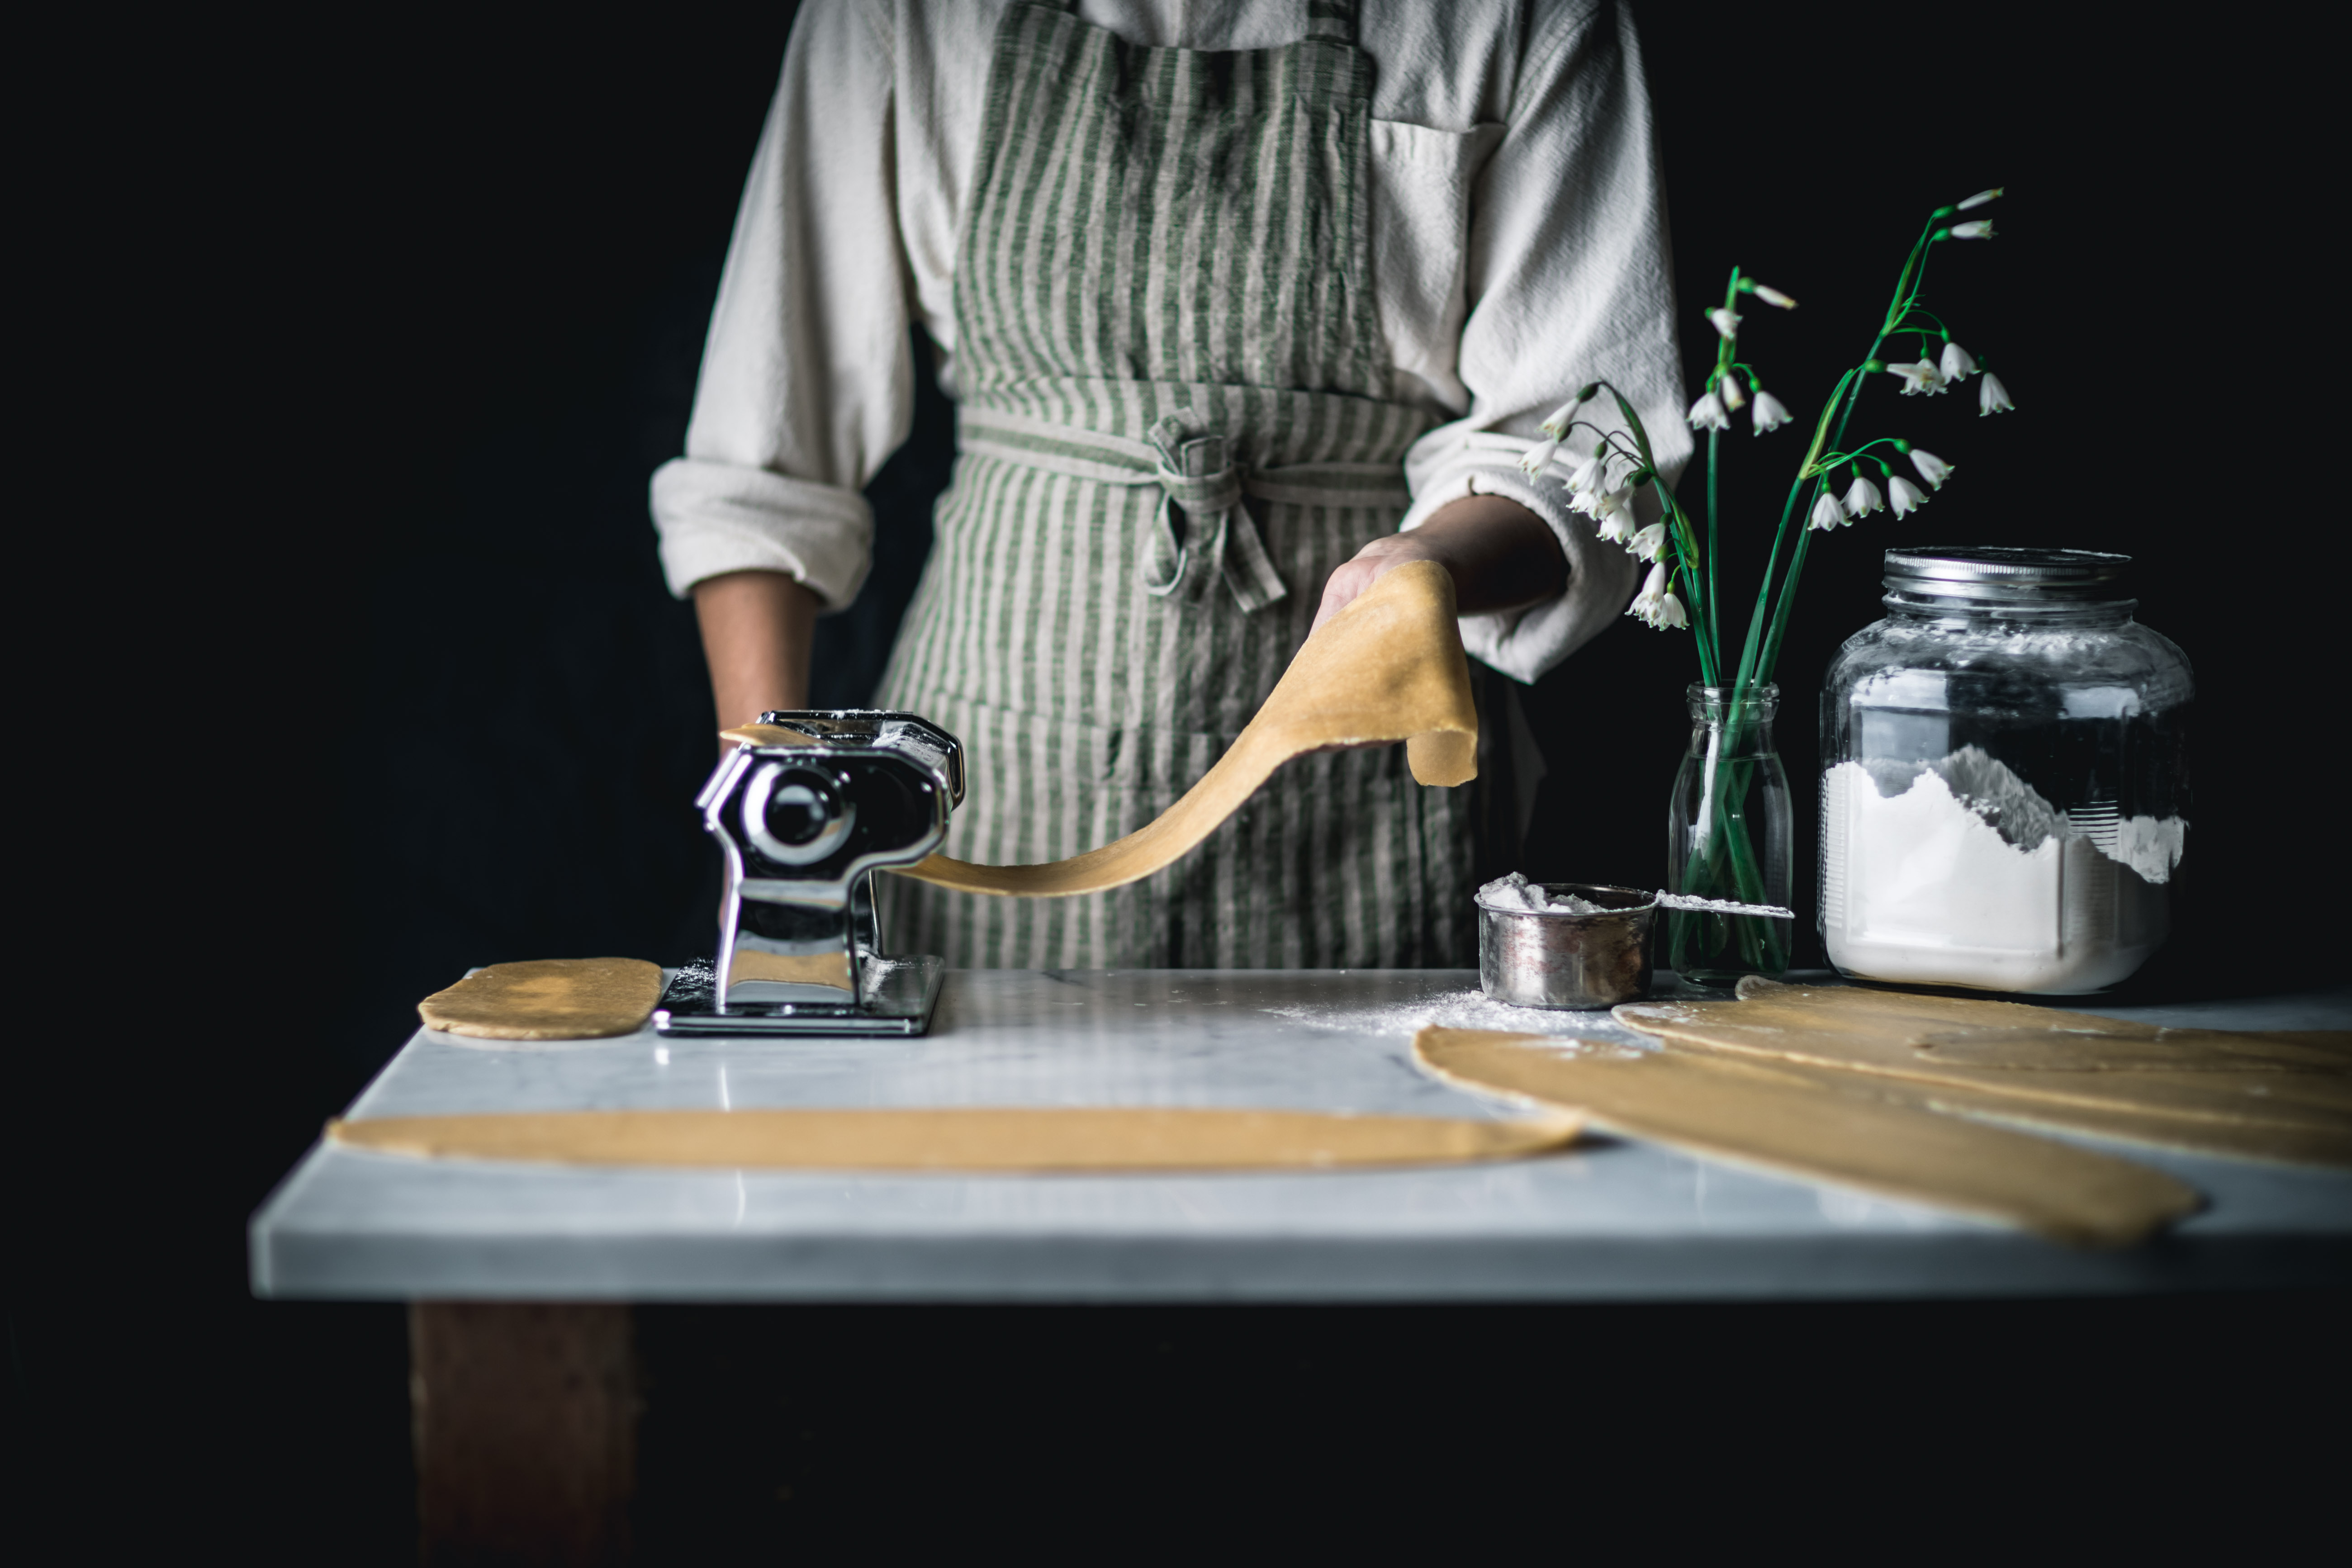 Using a Pasta Press